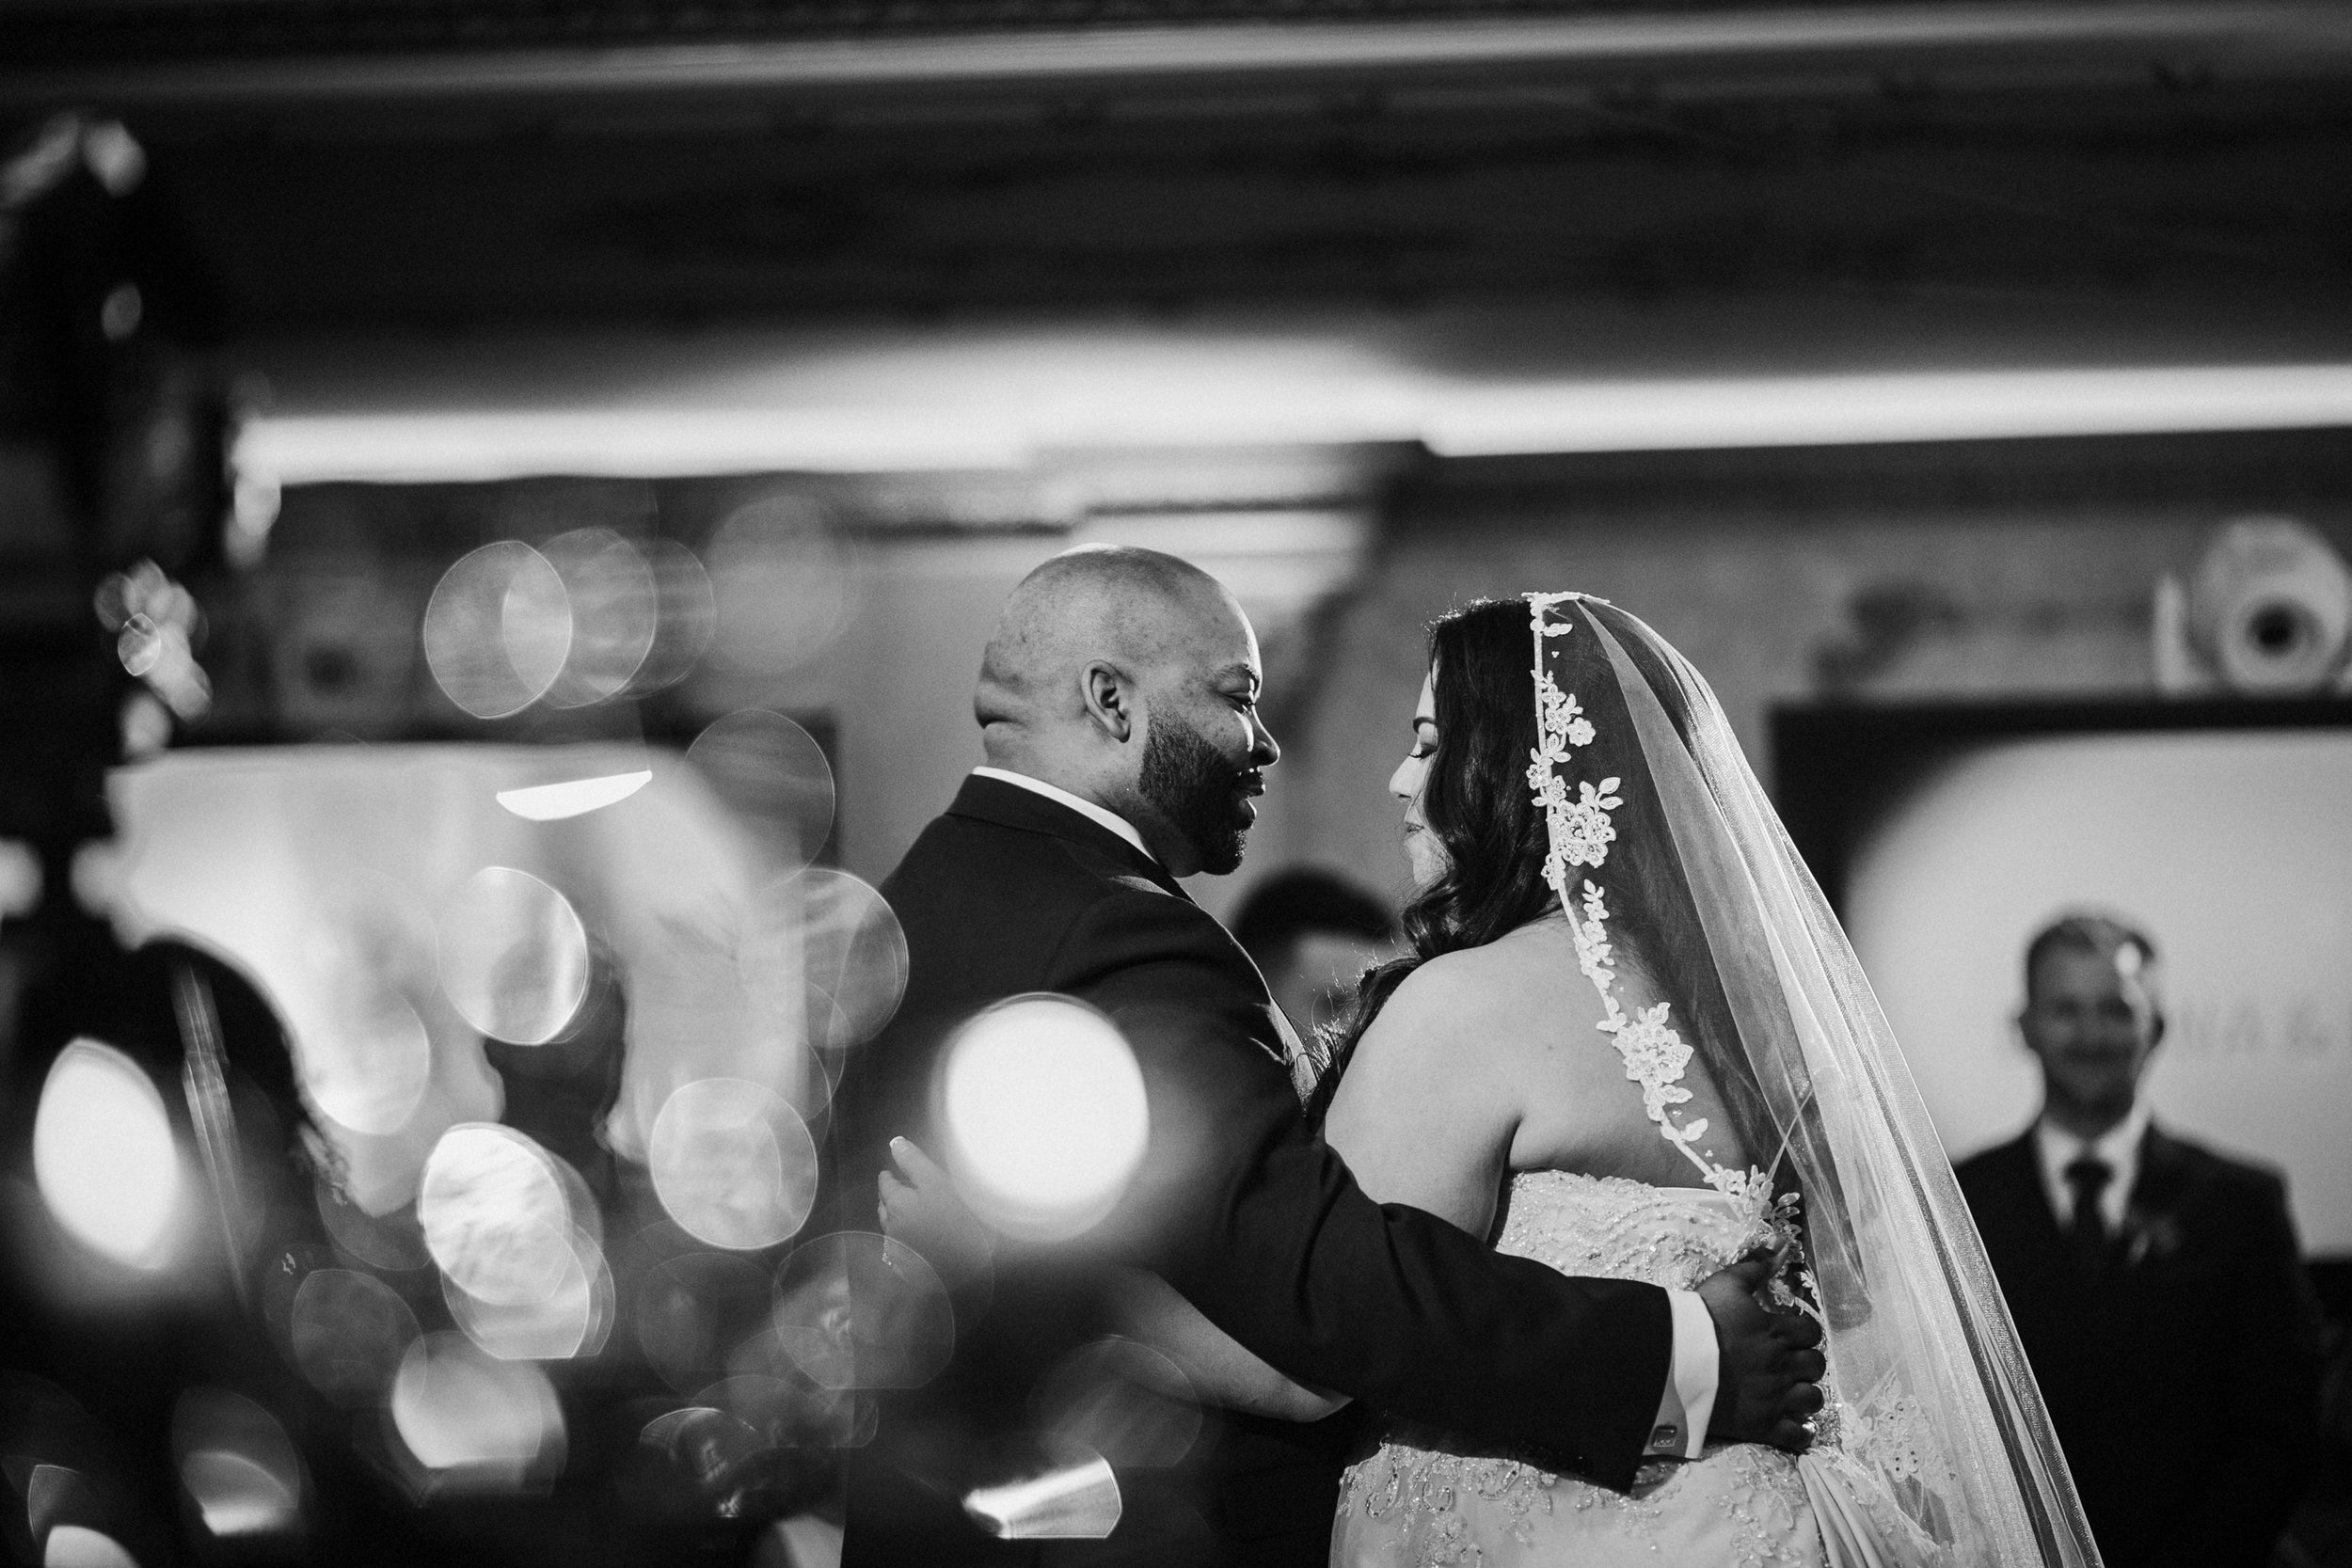 New-Jersey-Wedding-Photography-Brigalias-Deanna&Darryl-Reception-BW-27.jpg